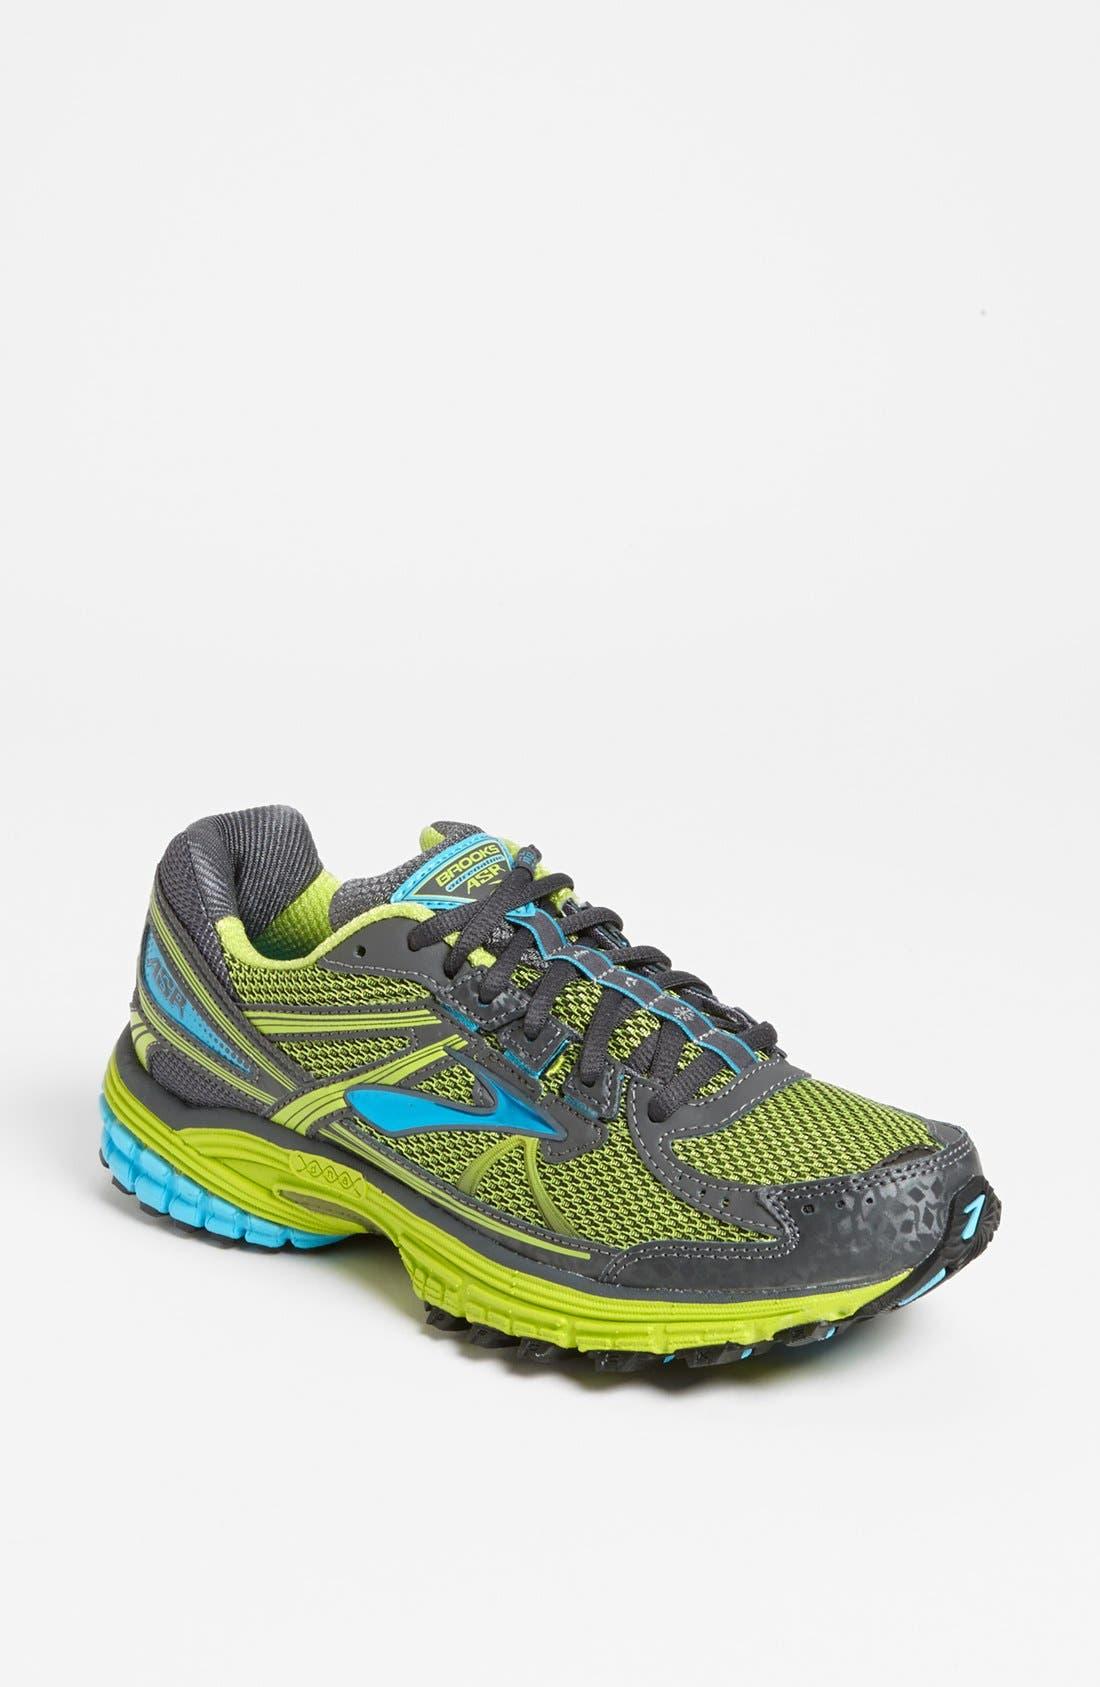 Alternate Image 1 Selected - Brooks 'Adrenaline ASR 10' Trail Running Shoe (Women)